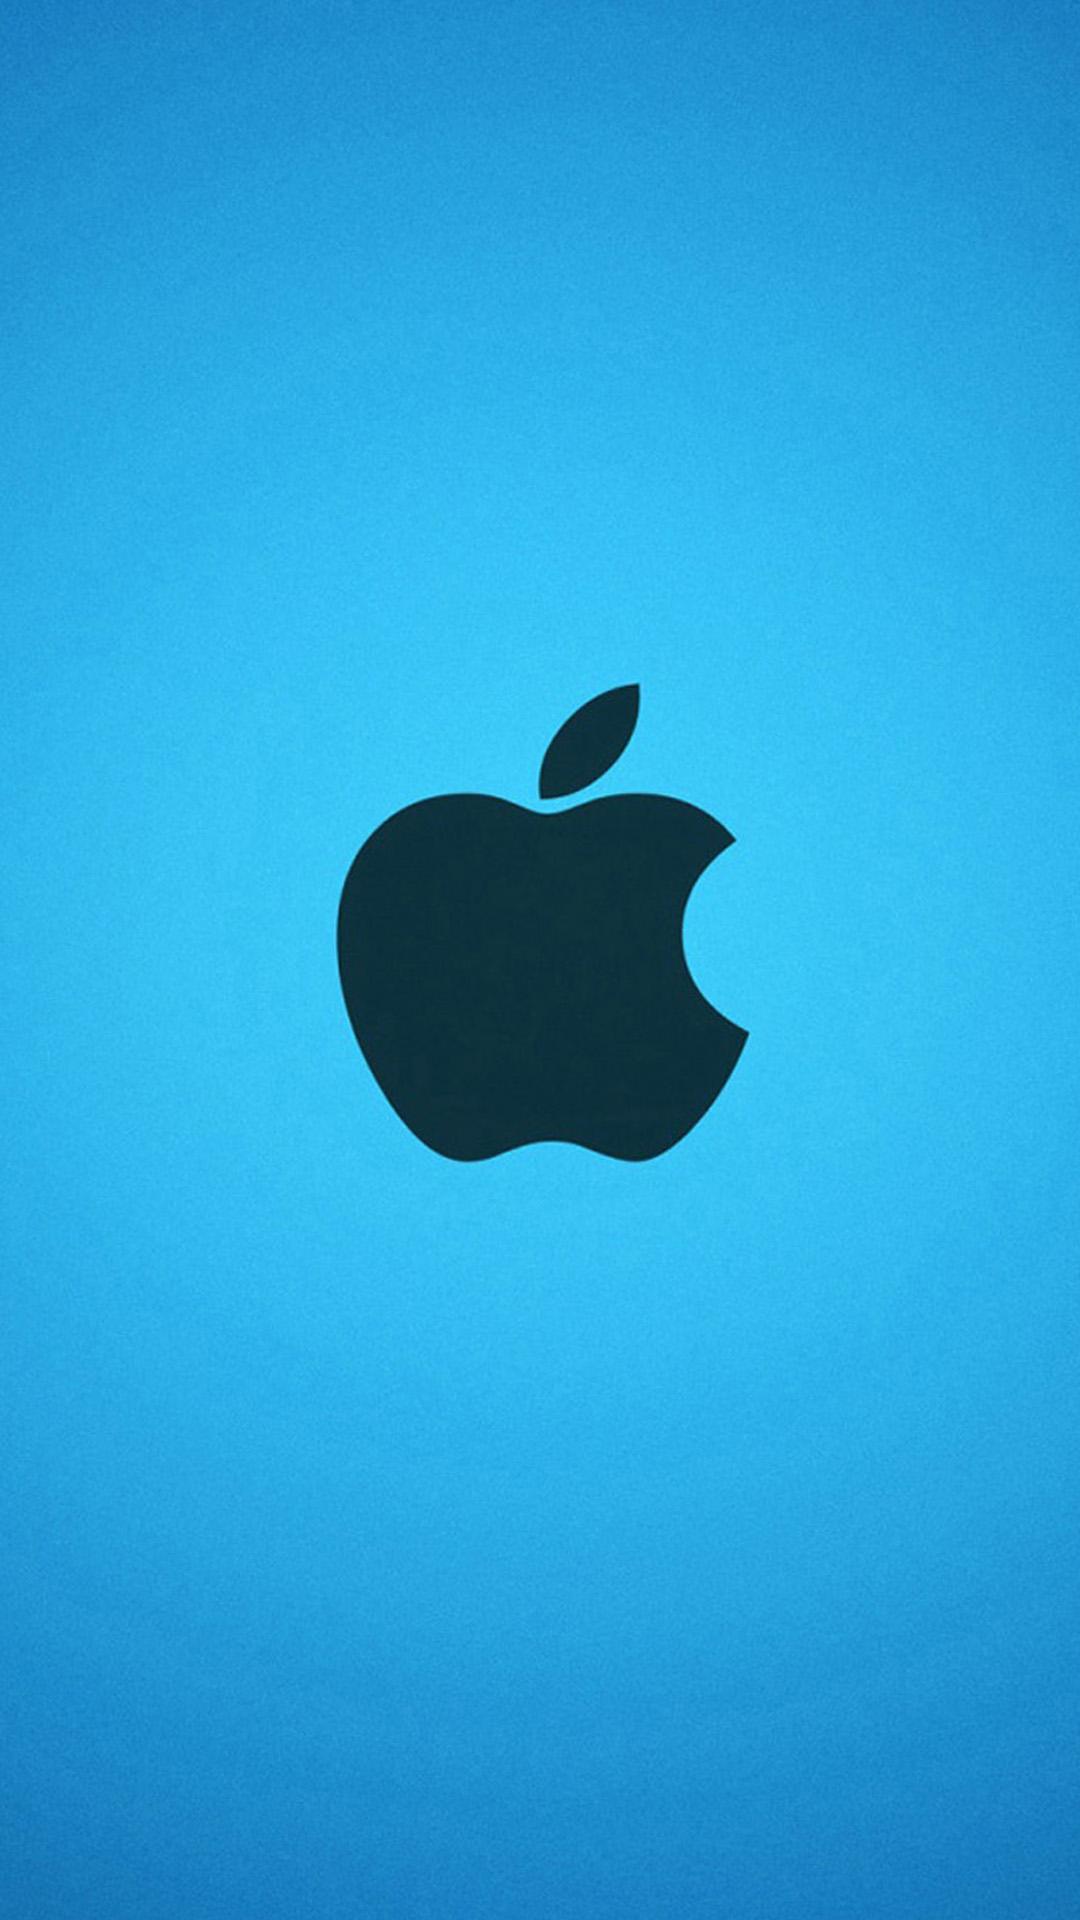 Apple iPhone 6 Plus Wallpaper 470 iPhone 6 Plus Wallpapers HD 1080x1920